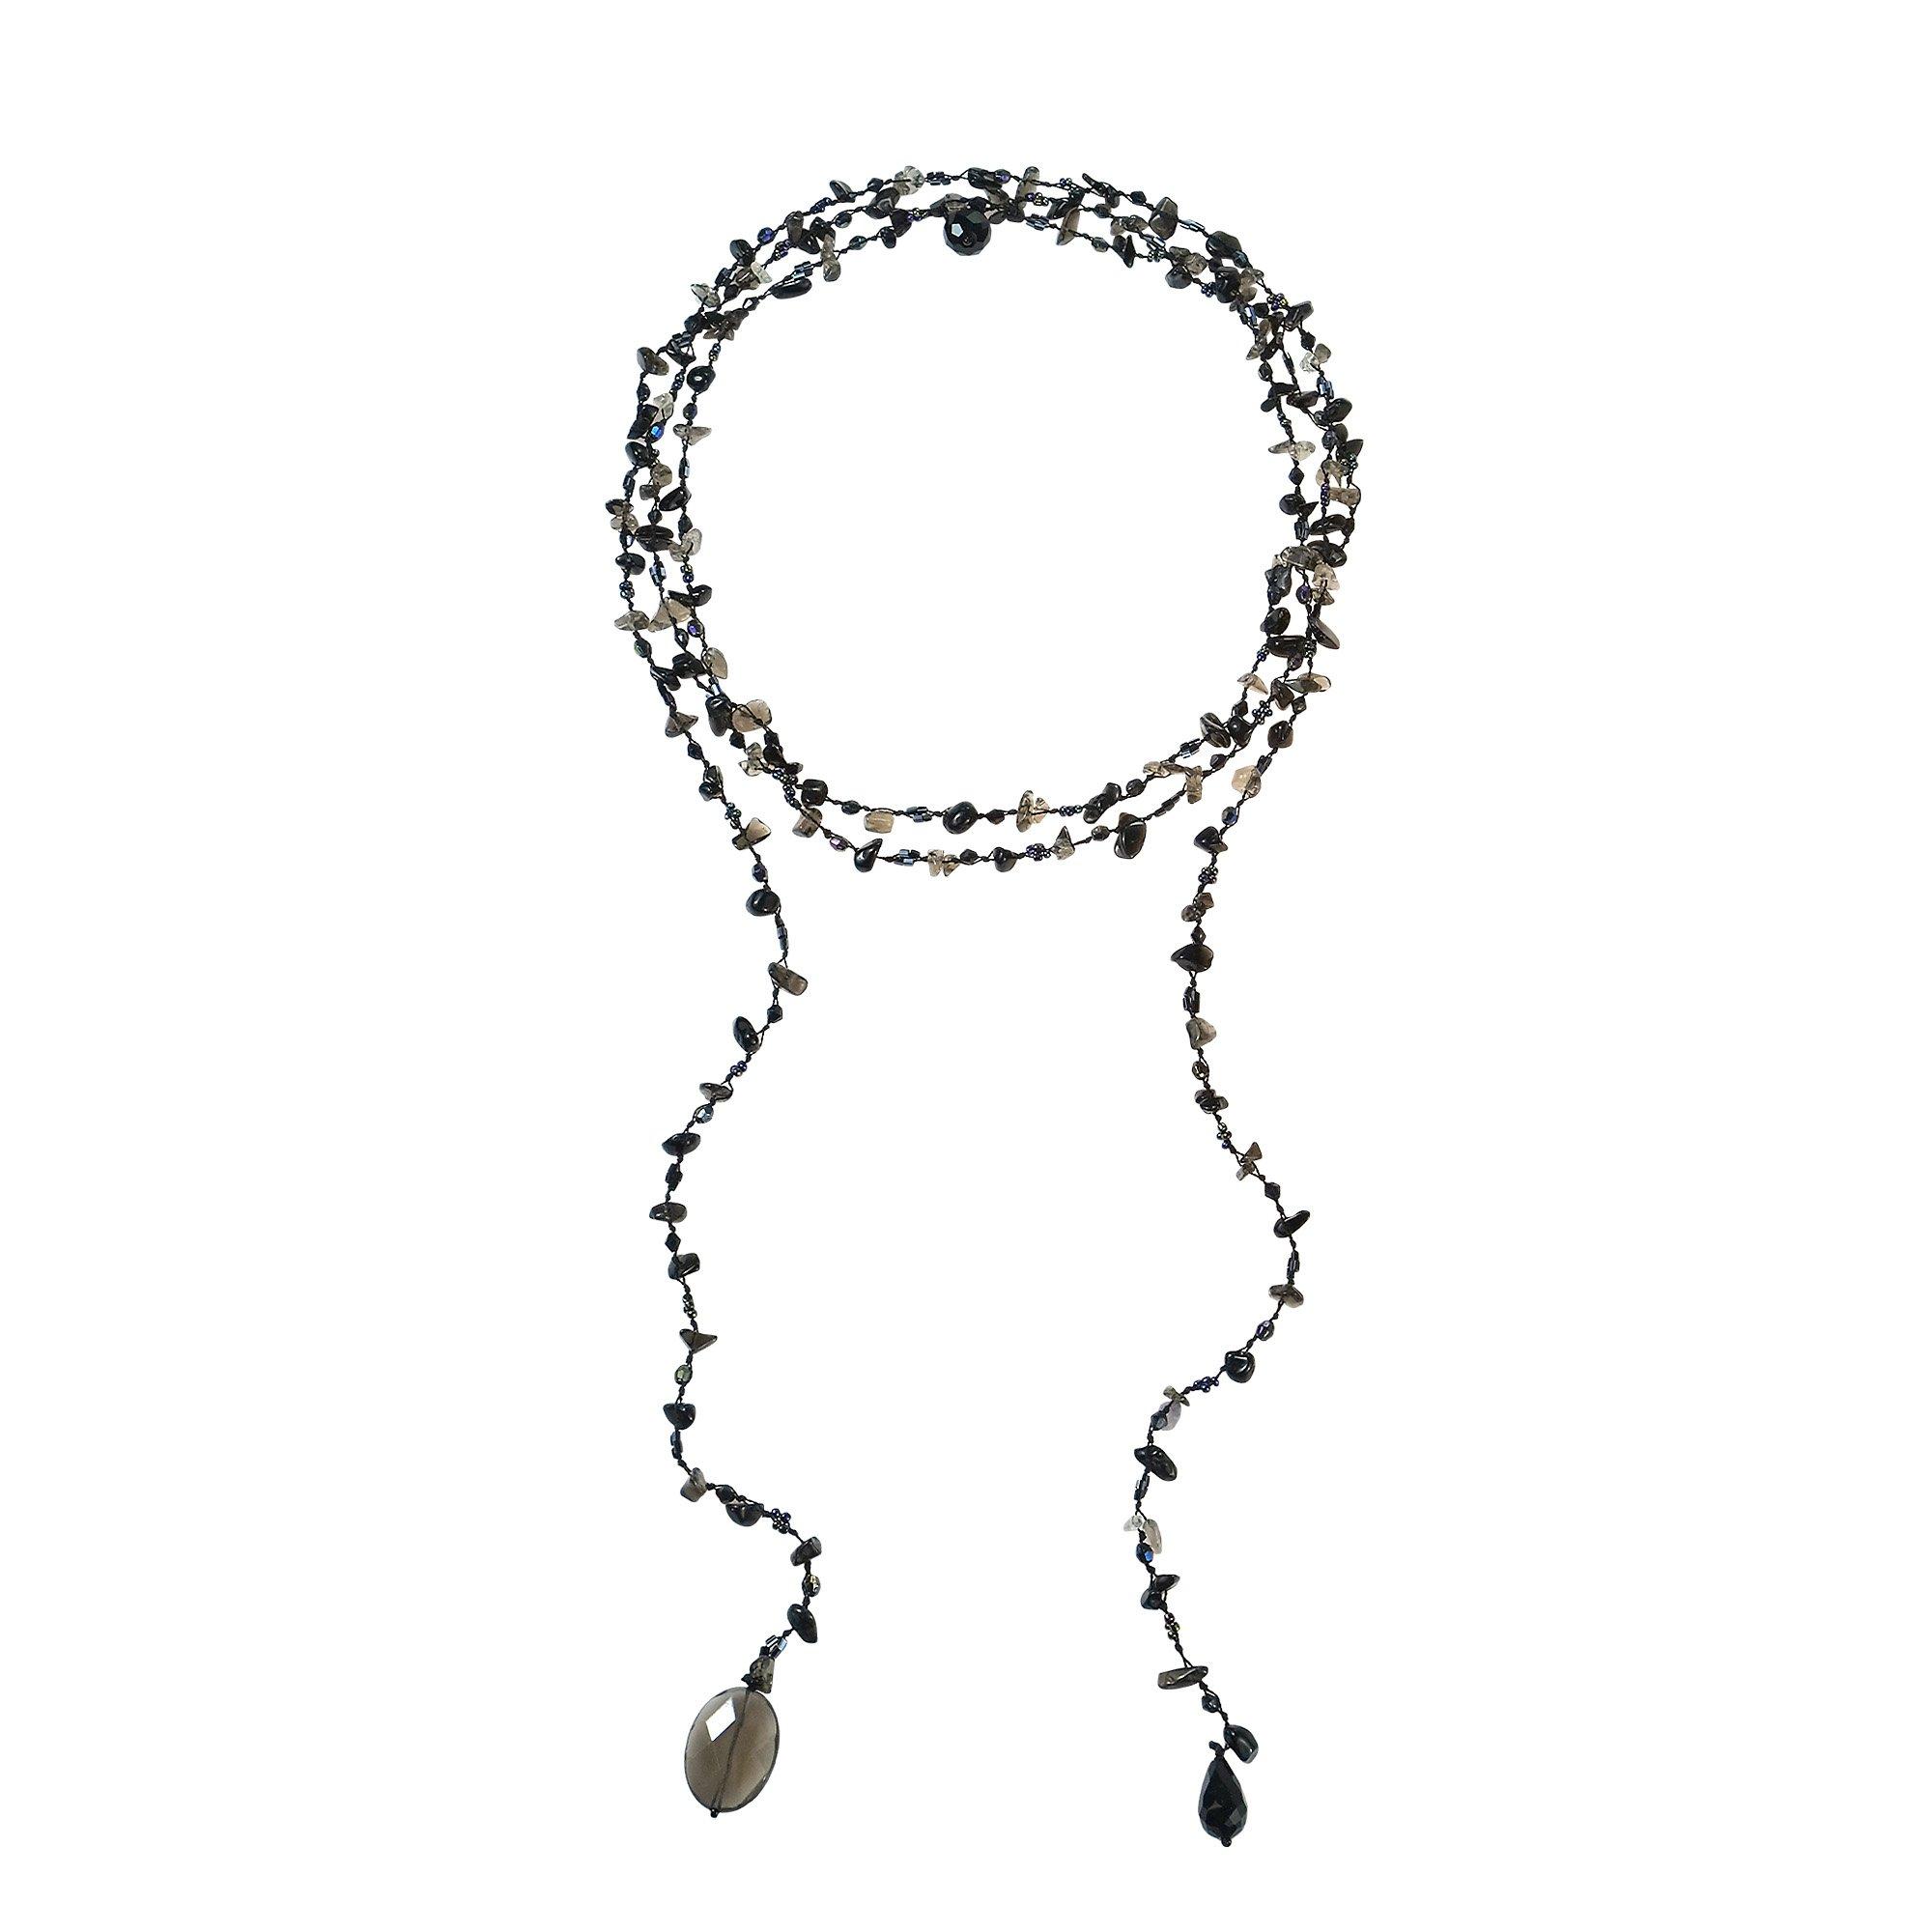 AeraVida Sparkling Aura Reconstructed Black Agate-Smokey Glass Lariat Necklace